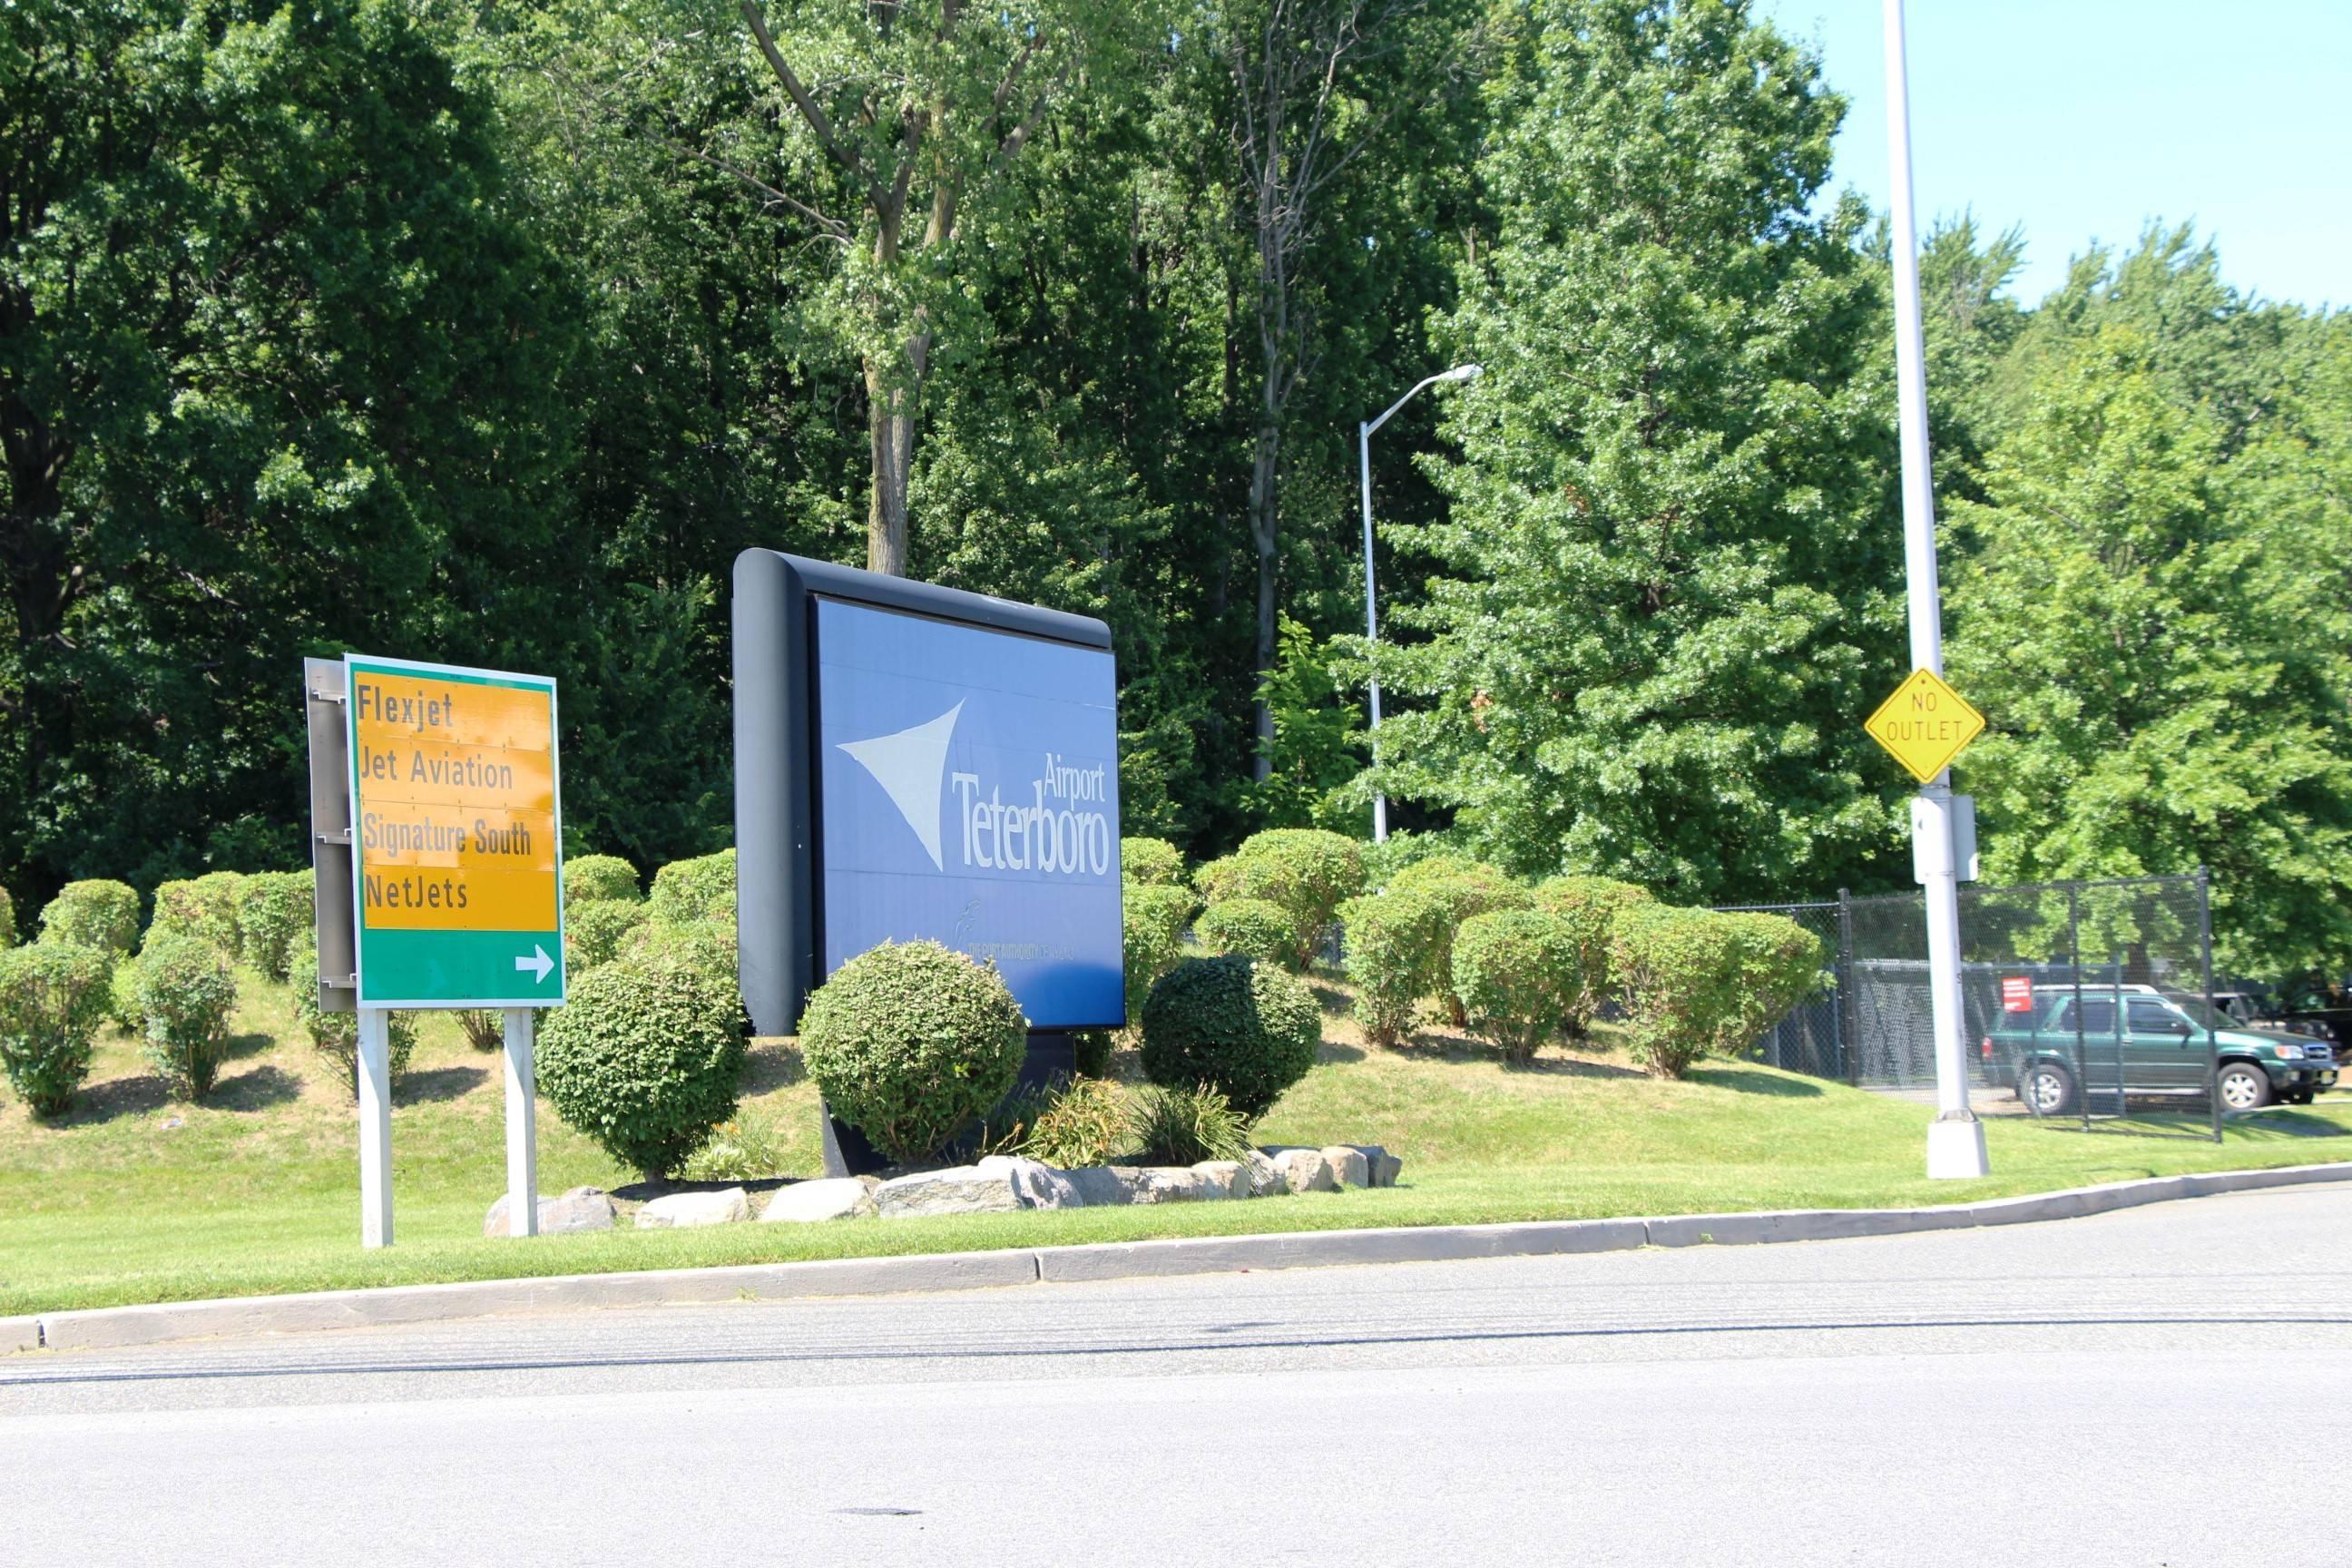 538ac1f7f0349eb3e791_EDIT_Teterboro_Airport_sign.jpg